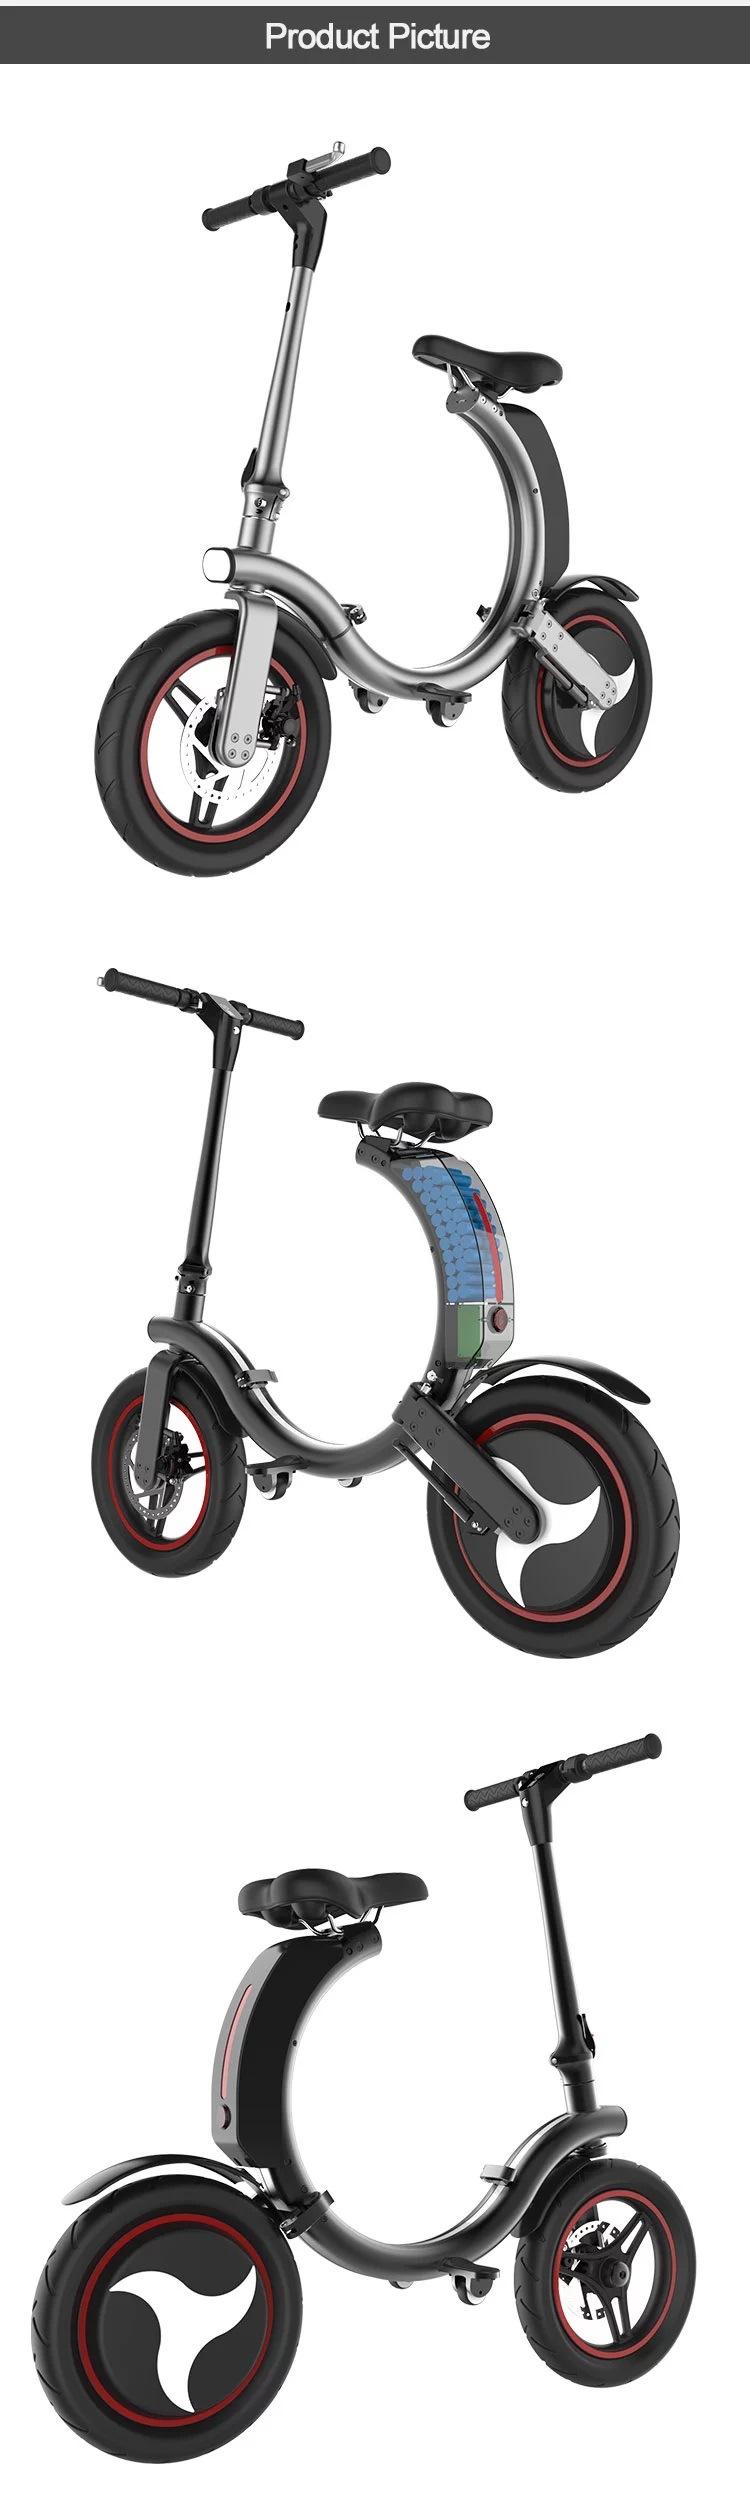 [Hot Item] 500W 14inch Full Folding Electric Bicycle, Foldable Ebike